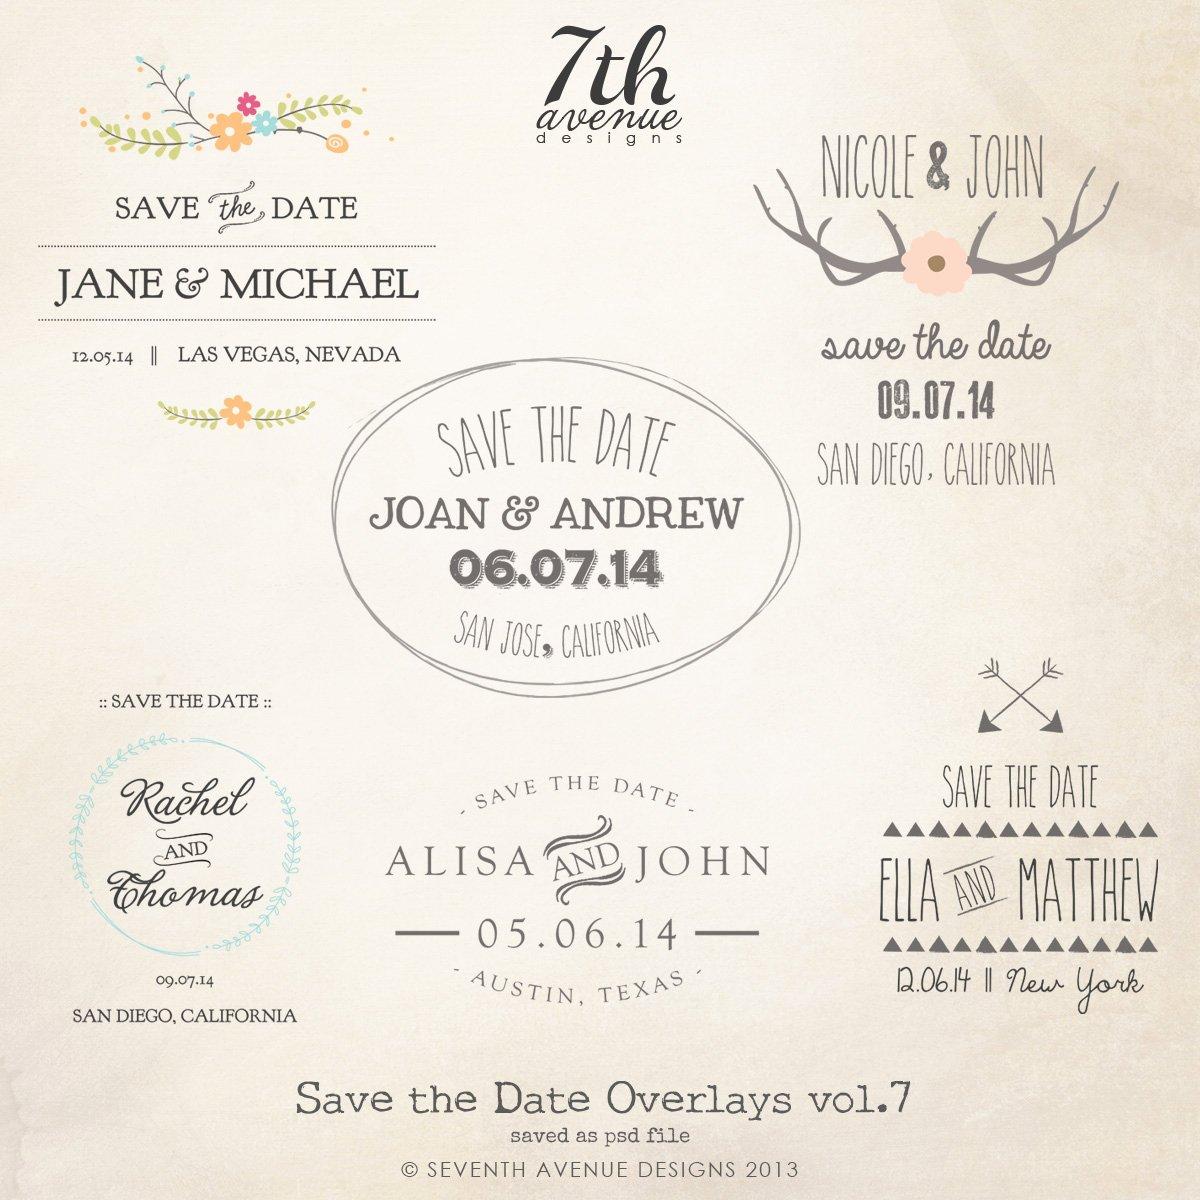 Save the Date Word Overlays Vol 7 [overlays Savethedate7